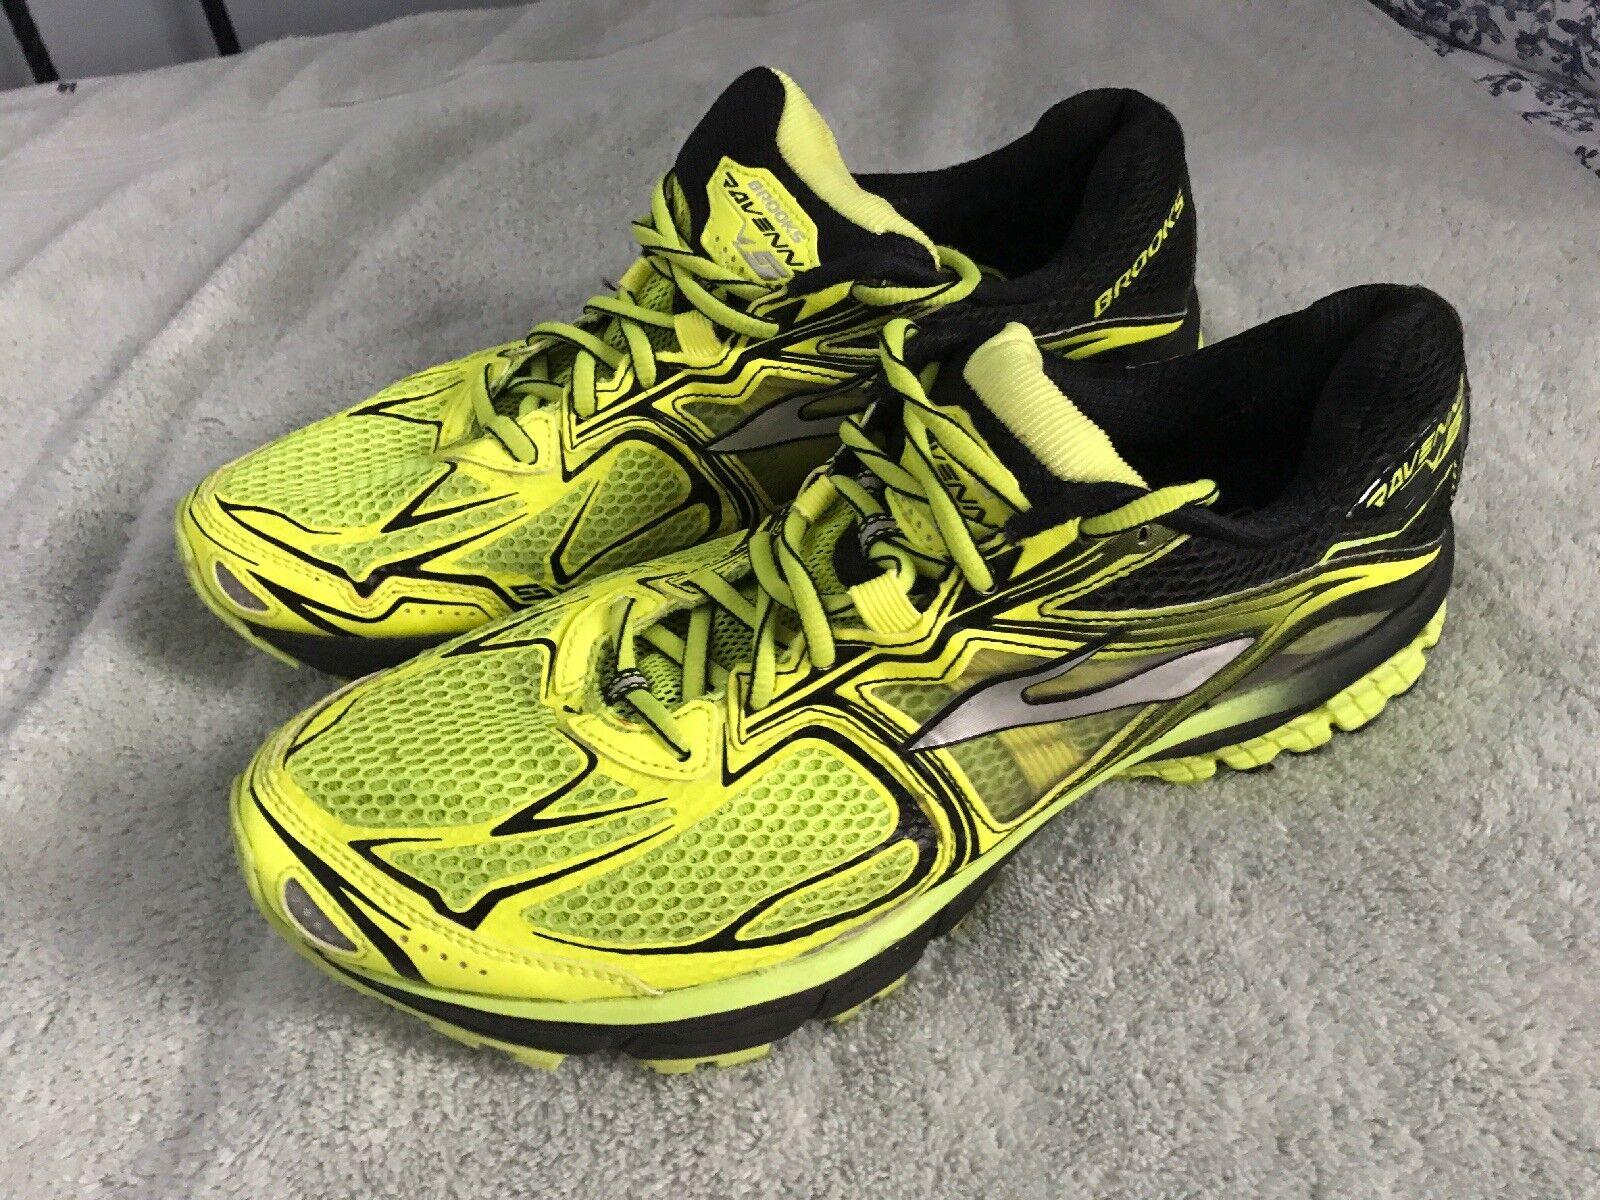 Brooks Avenna Sneaker - Men's Size 12 M, Black Neon Yellows SC8